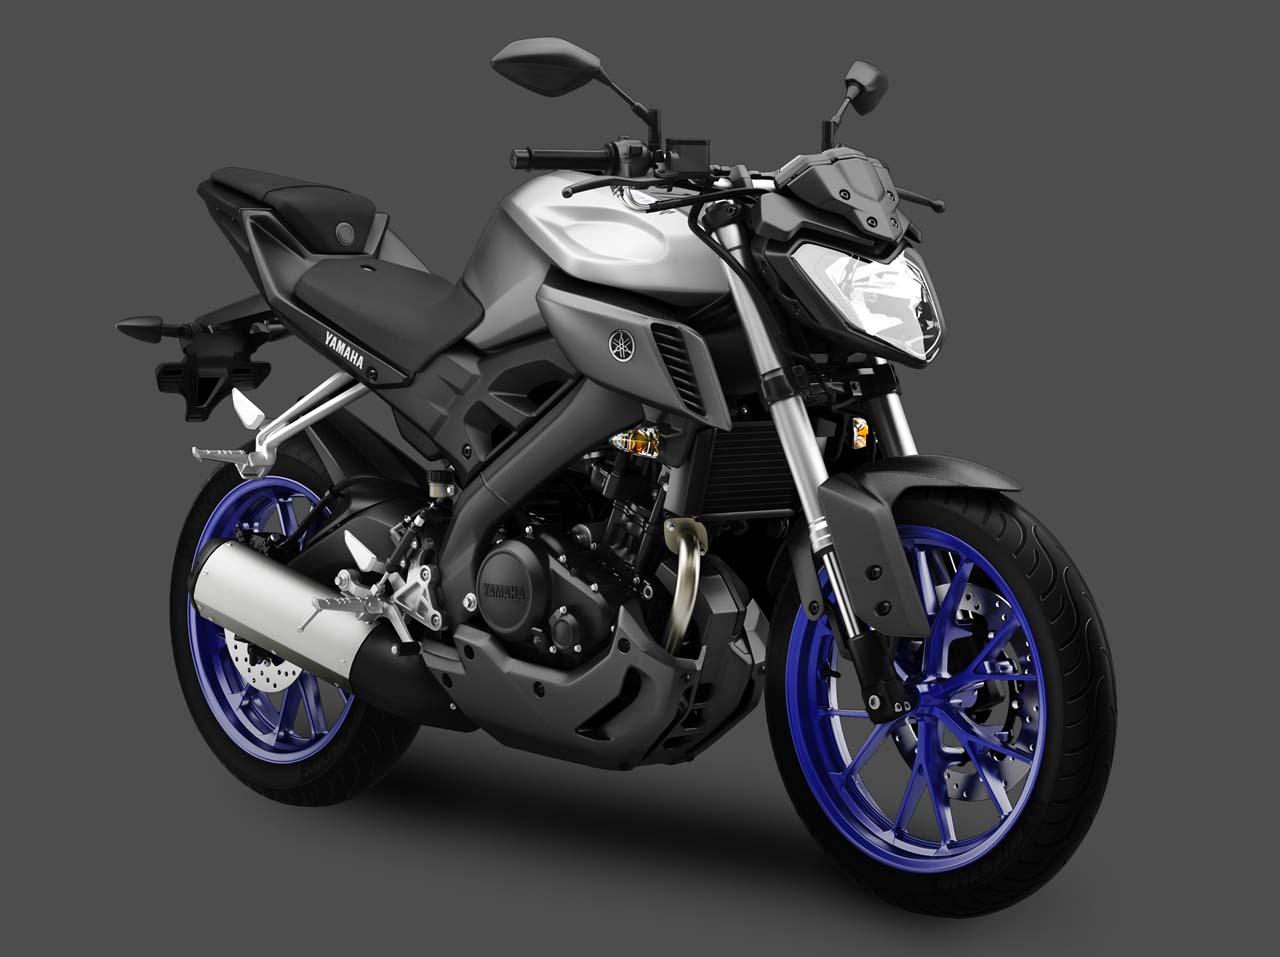 Yamaha Mt 125 Little Bike Offers Big Style Diseno Art